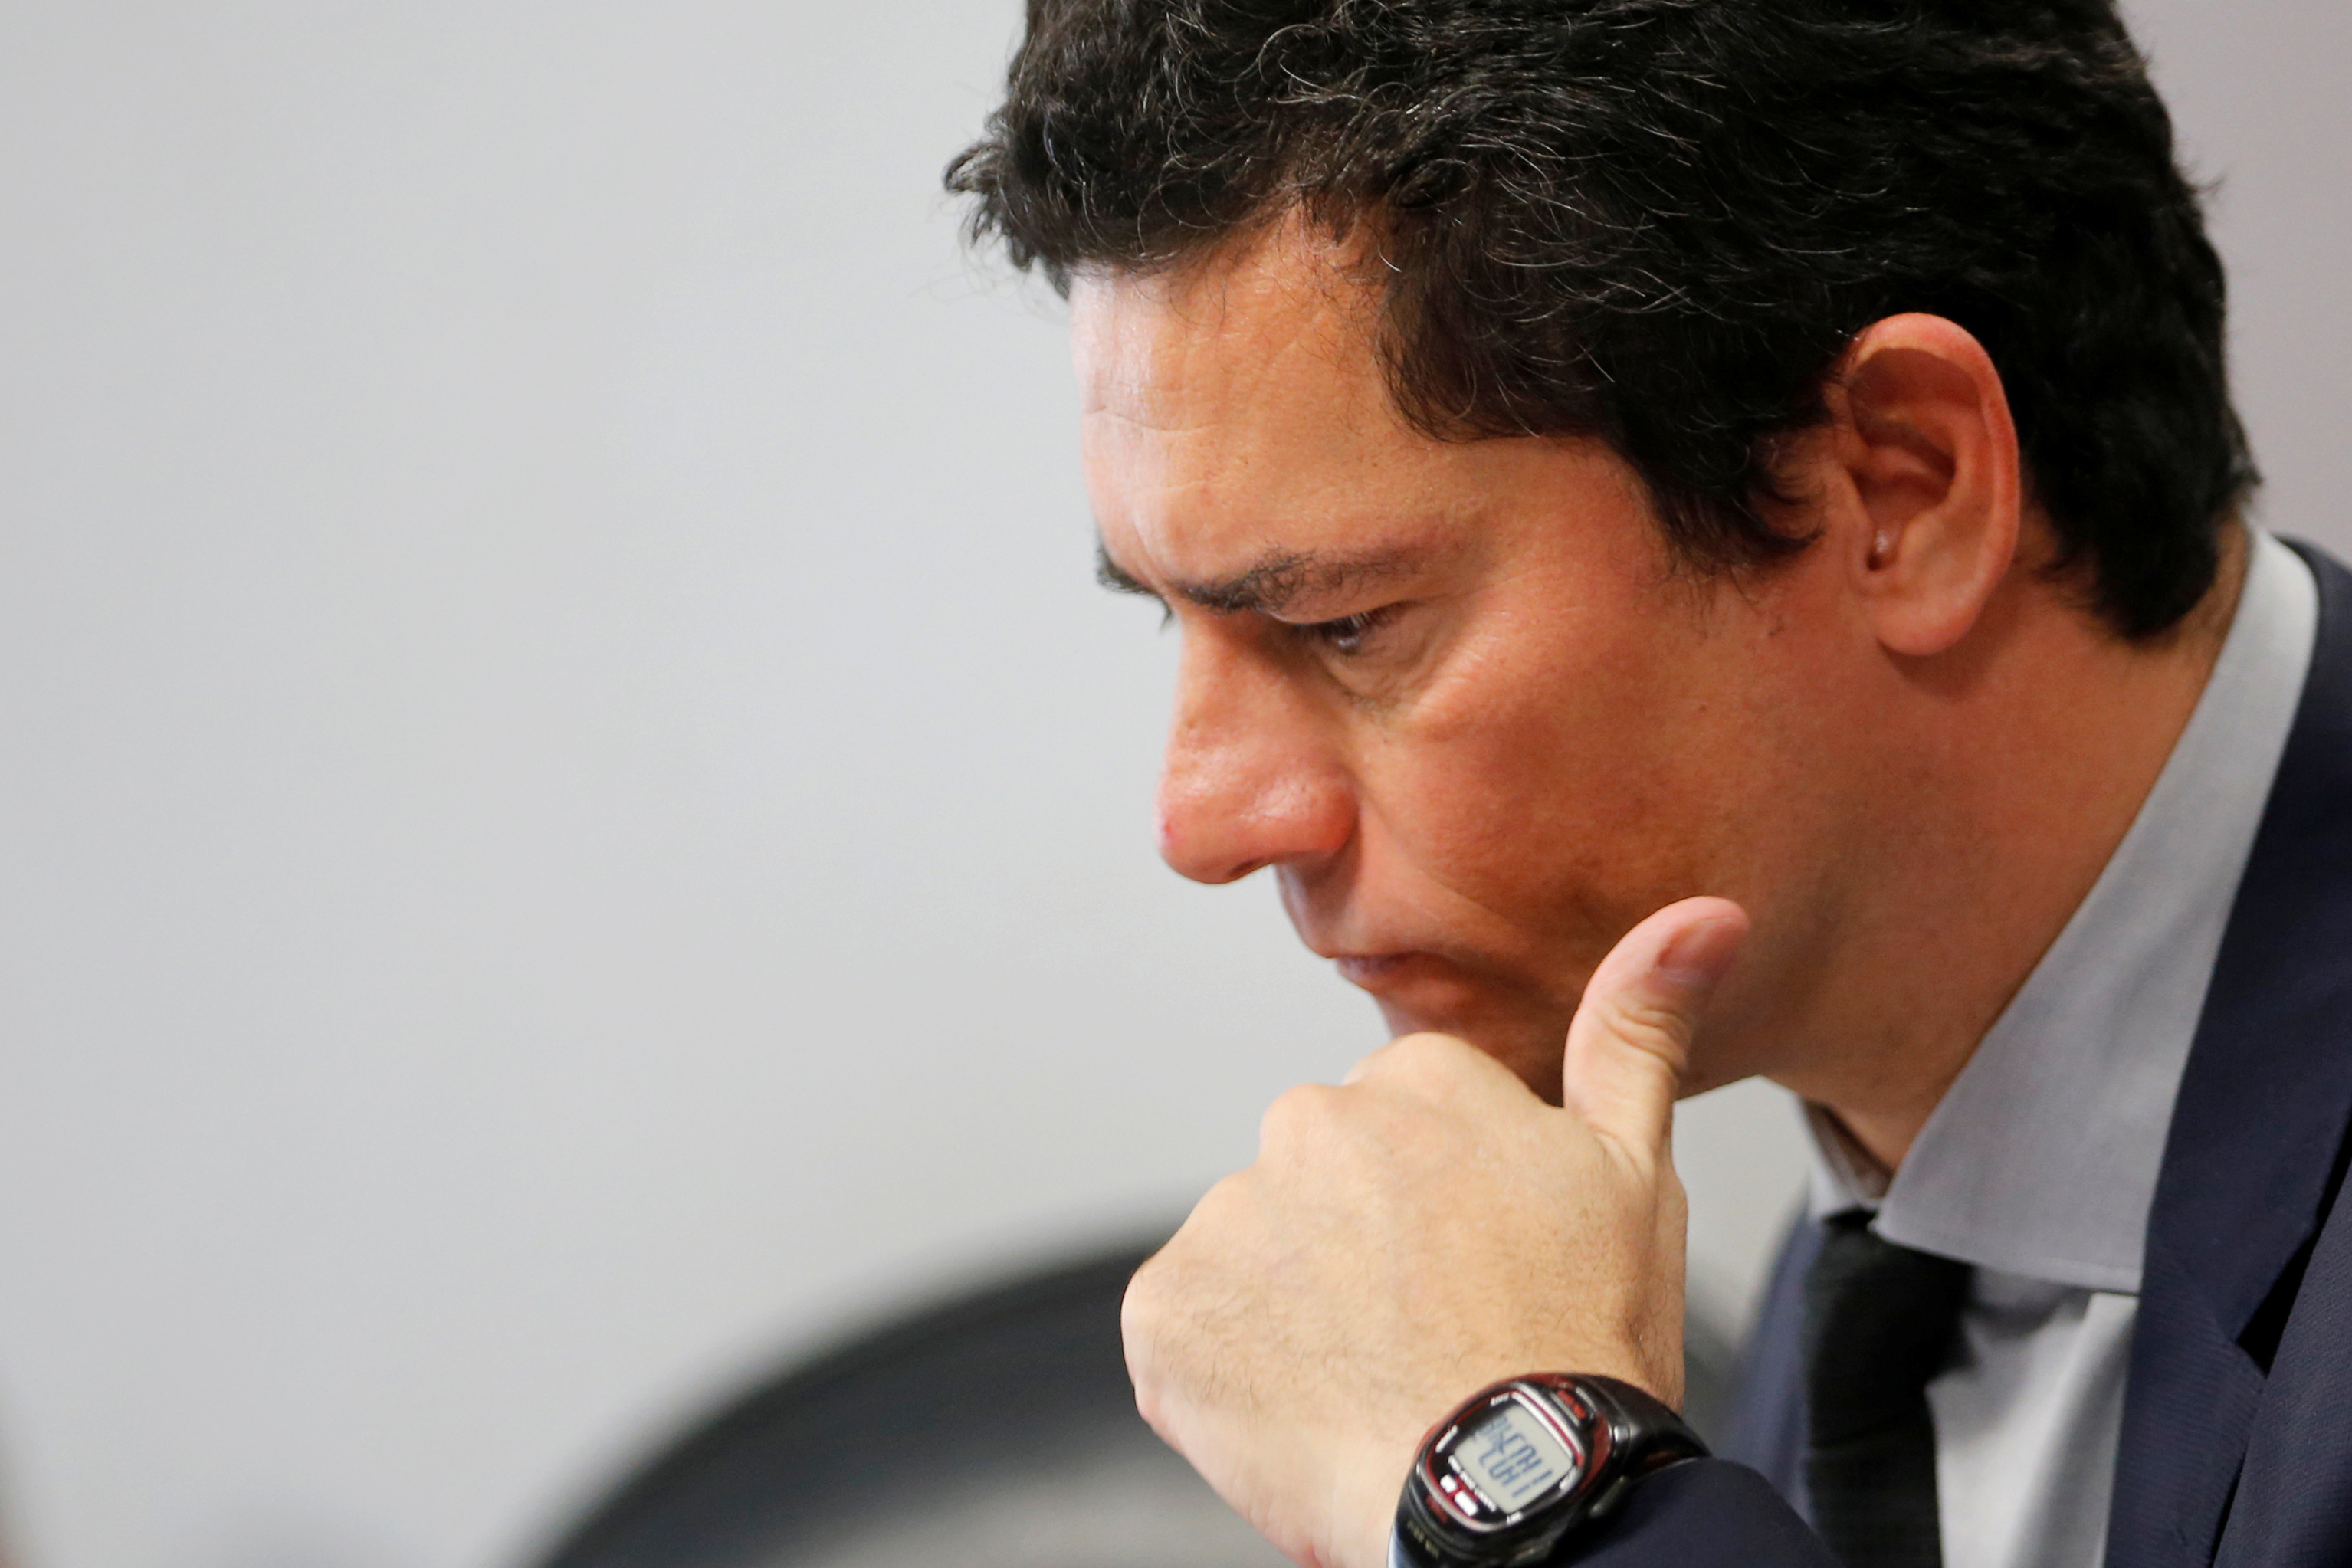 Sergio Moro, Ministro da Justiça, Segurança Pública